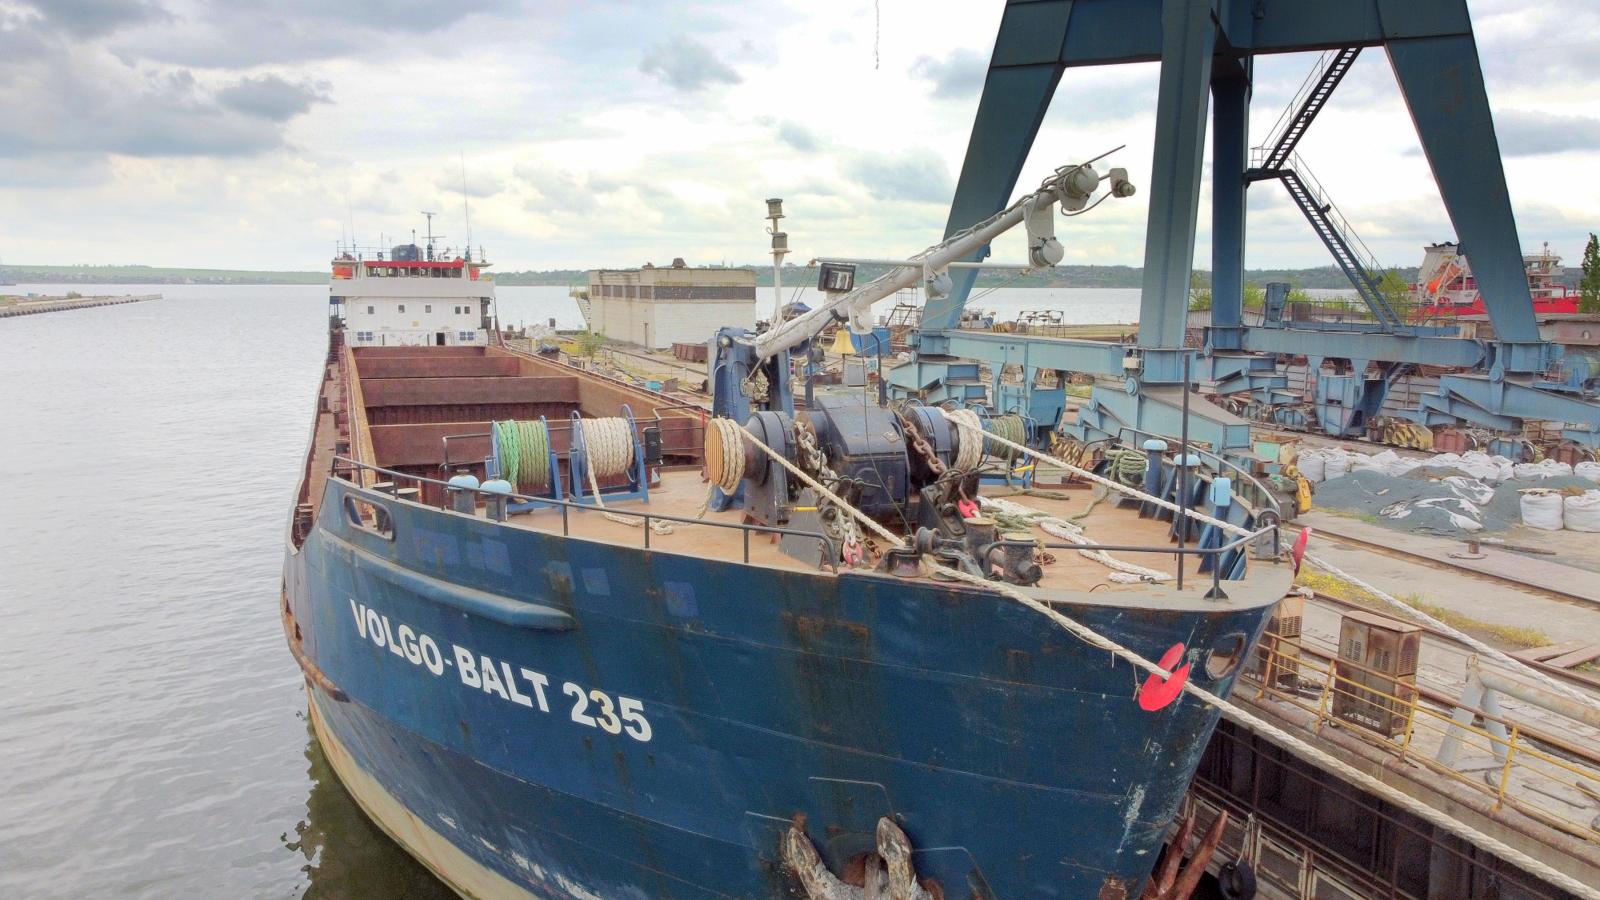 «Океан» принял на ремонт сухогрузное судно «Волго-Балт 235»